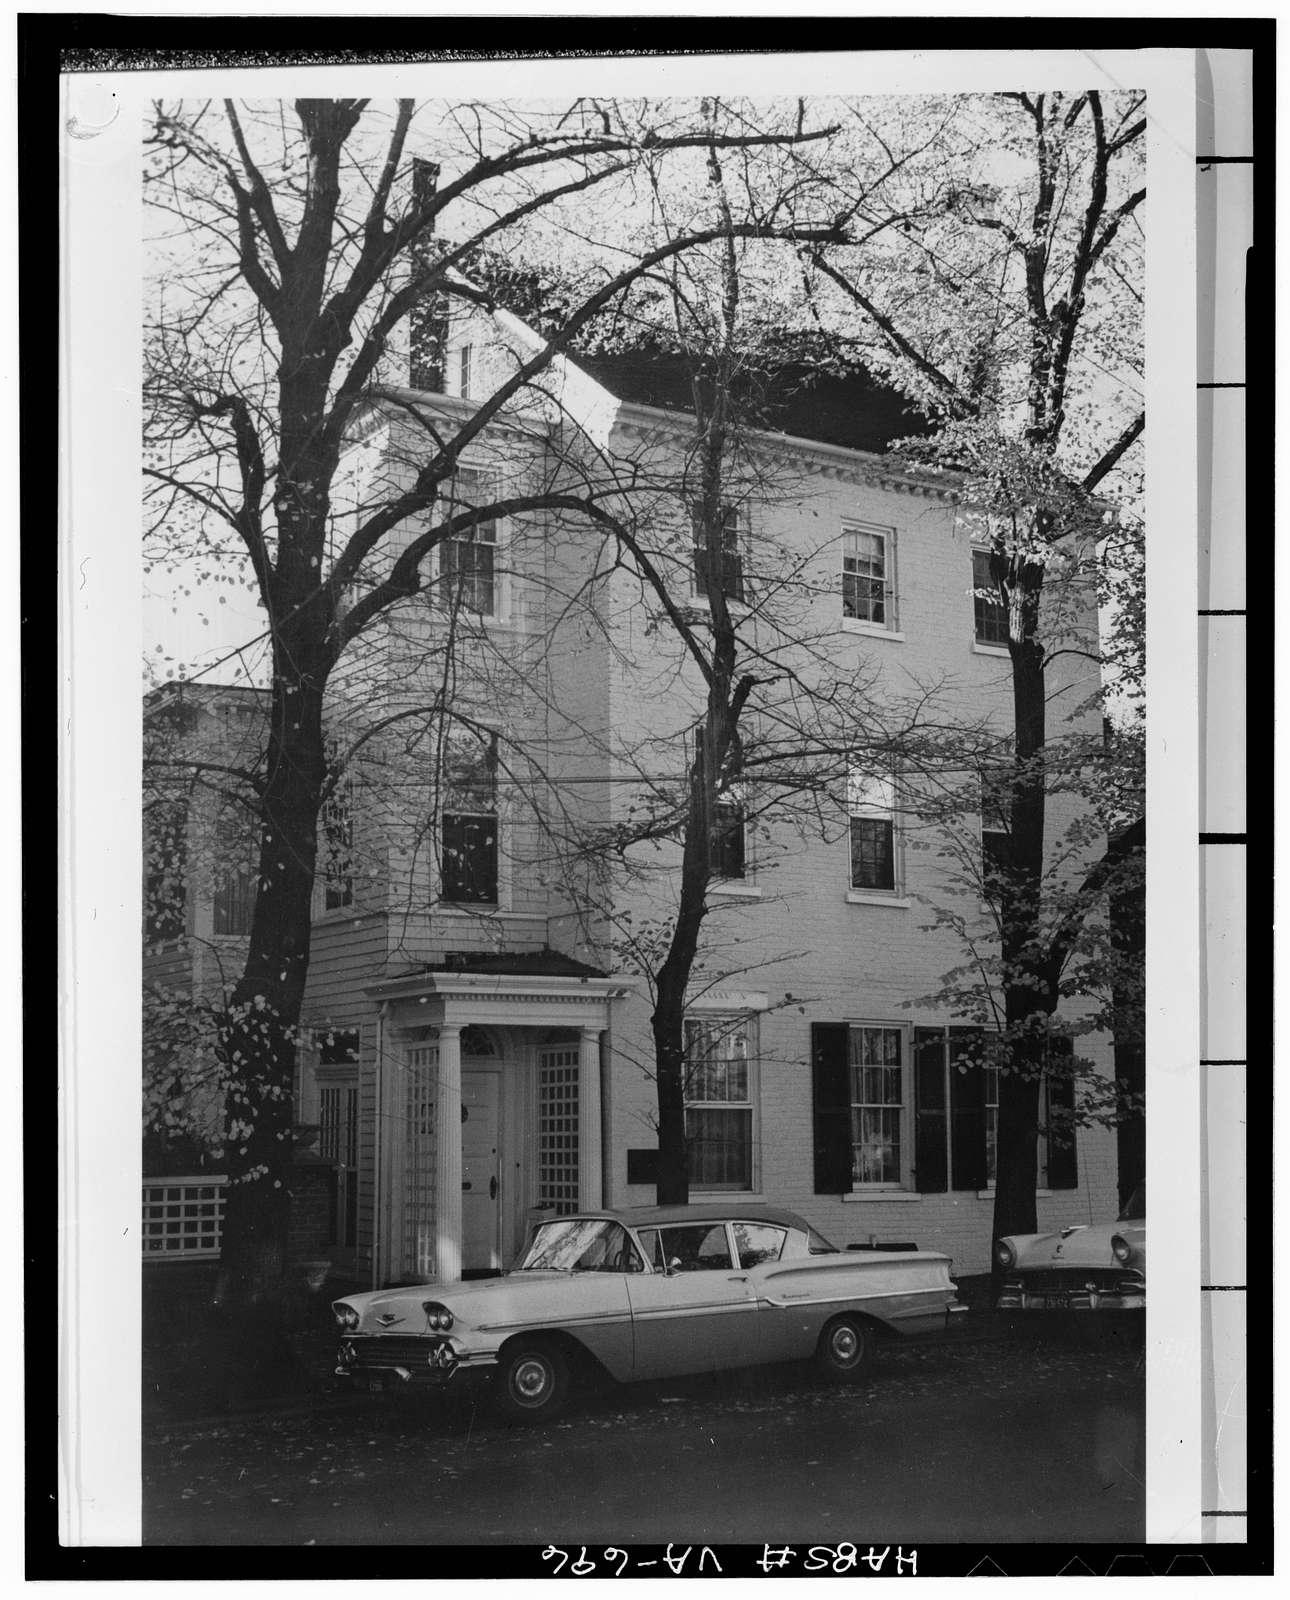 Dick-Janney House, 408 Duke Street, Alexandria, Independent City, VA